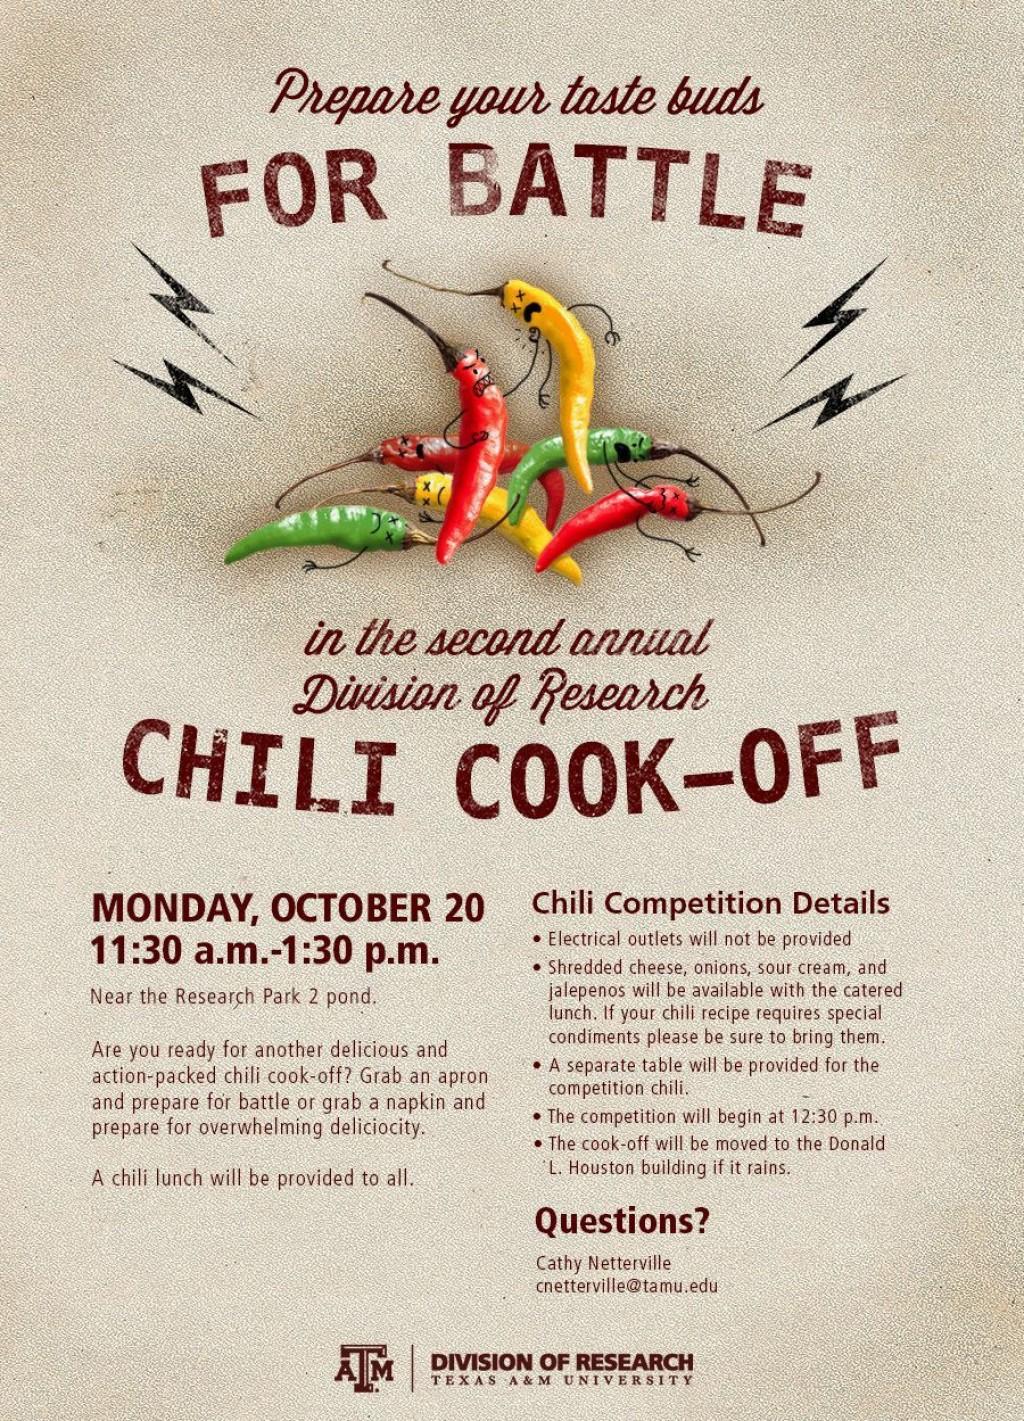 003 Singular Chili Cook Off Flyer Template Design  Halloween Office PowerpointLarge